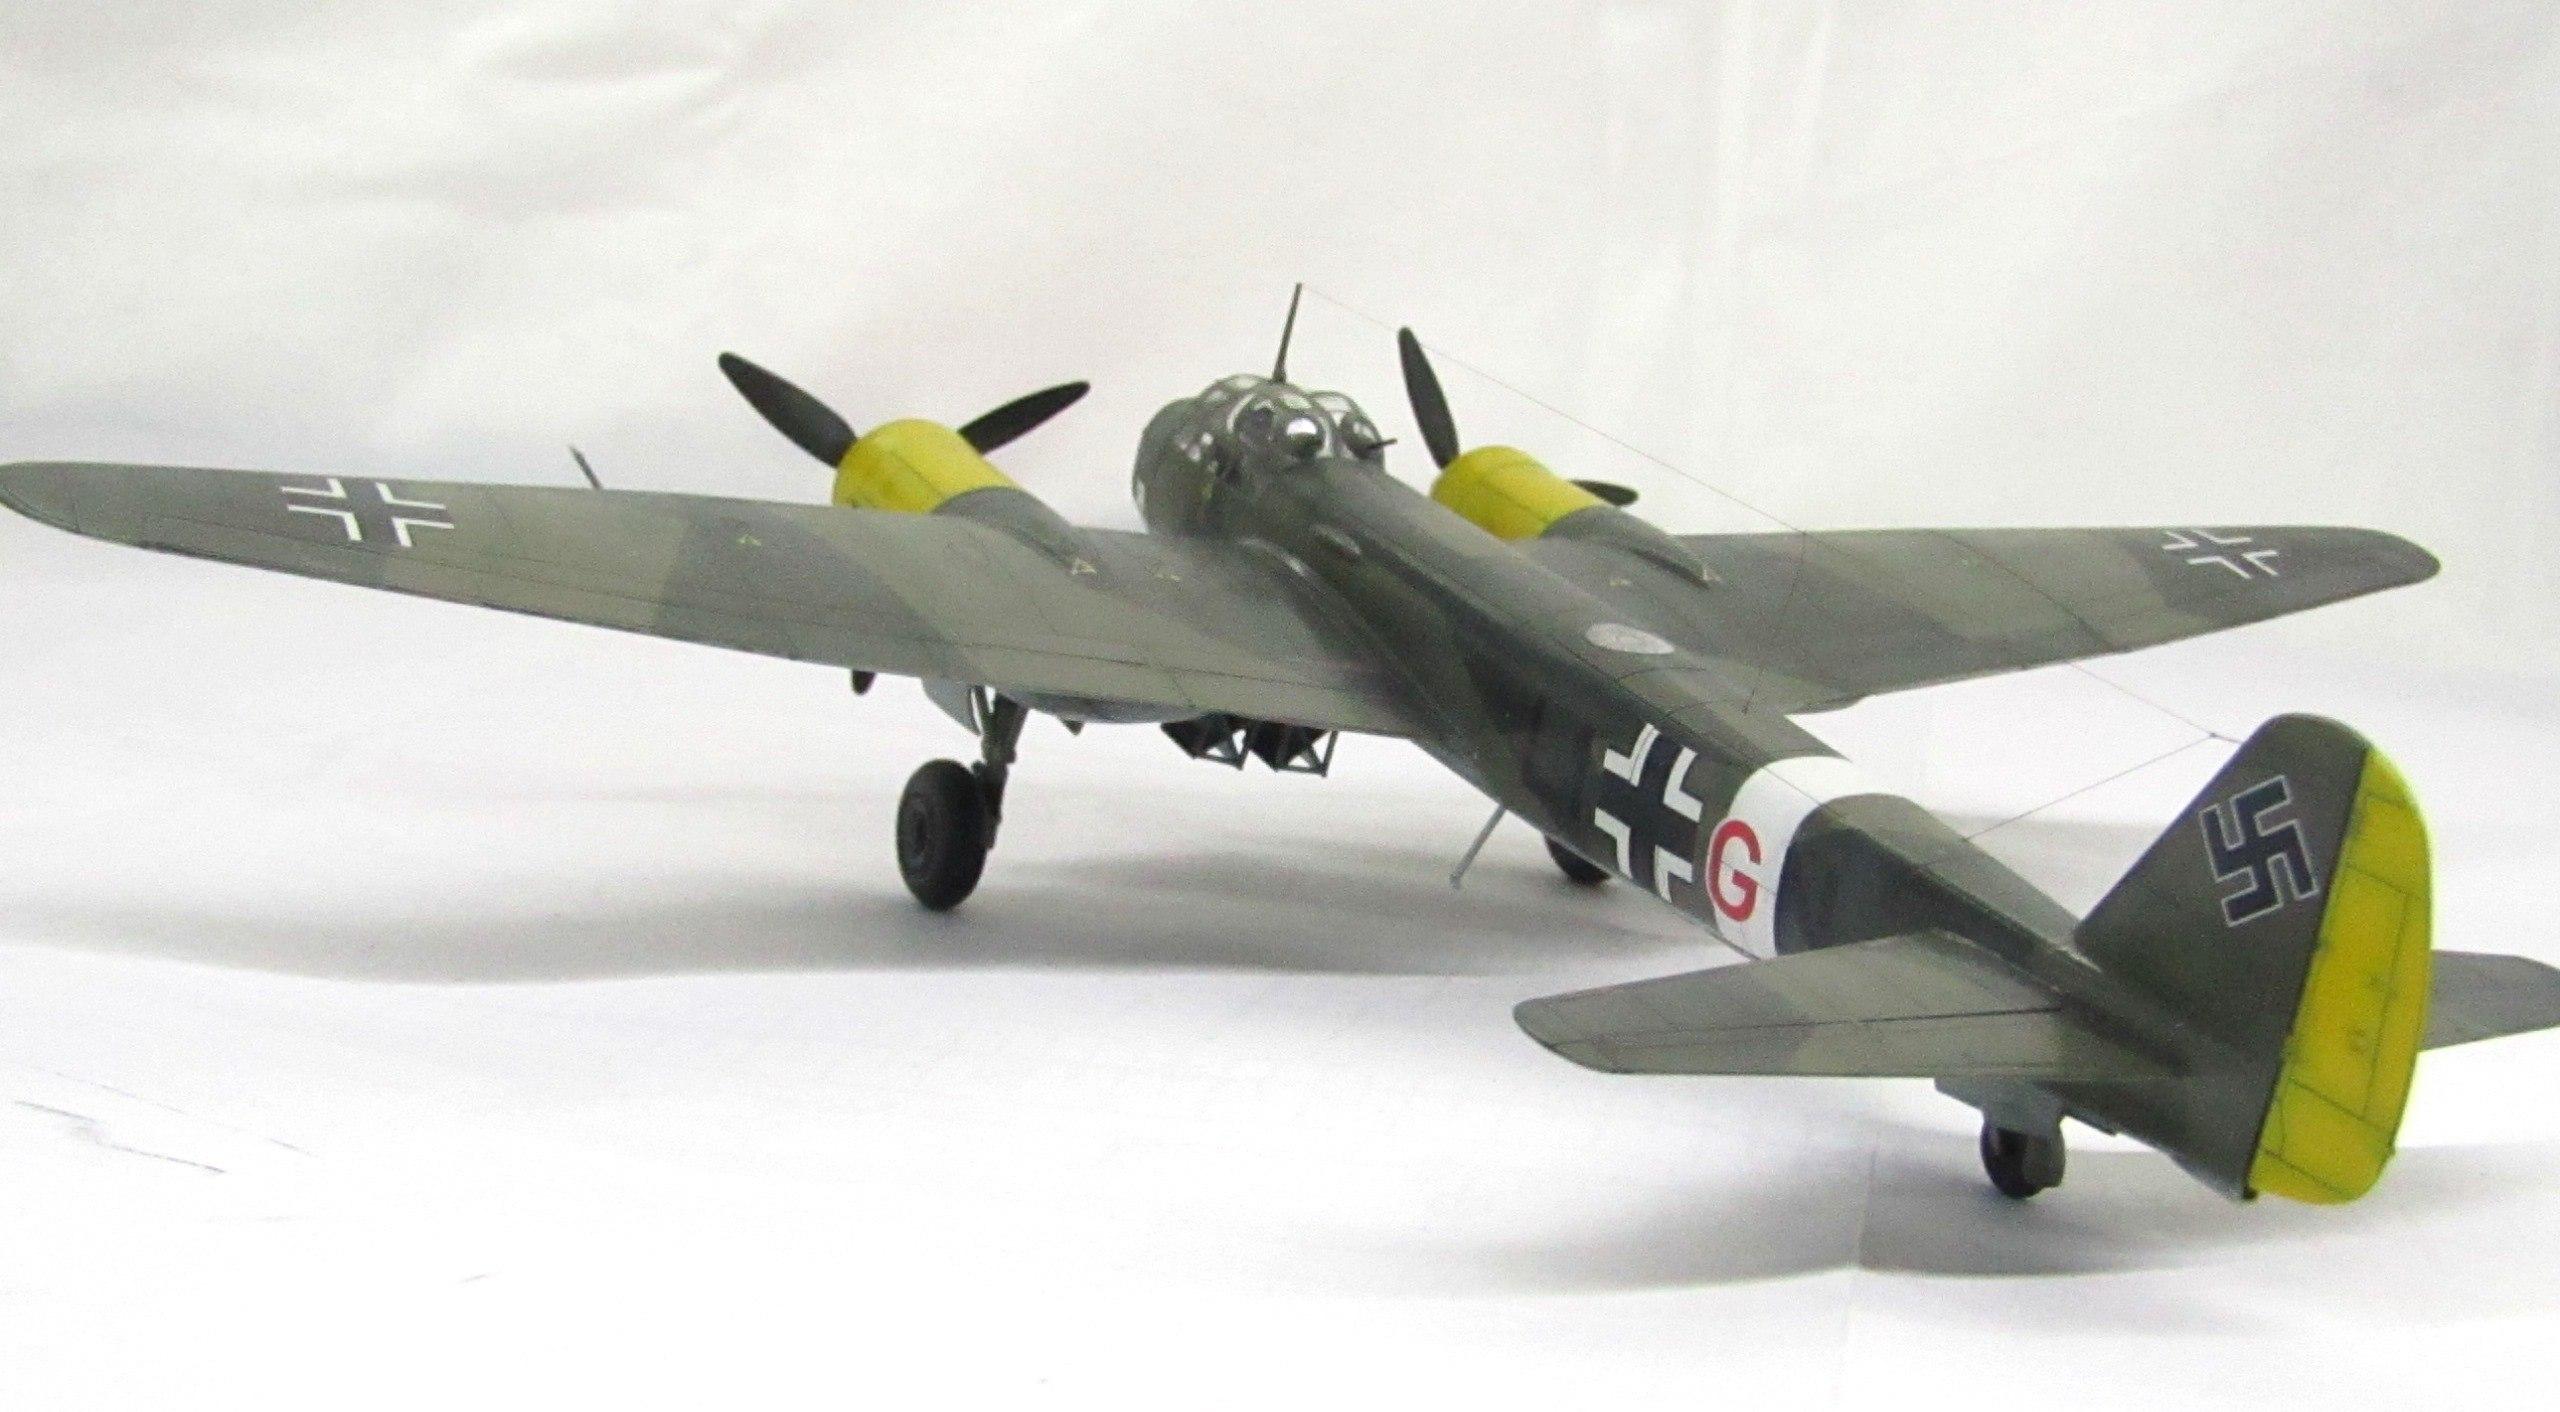 Ju-88 A-4 1/72 (Звезда) MQa_dvlpDPc